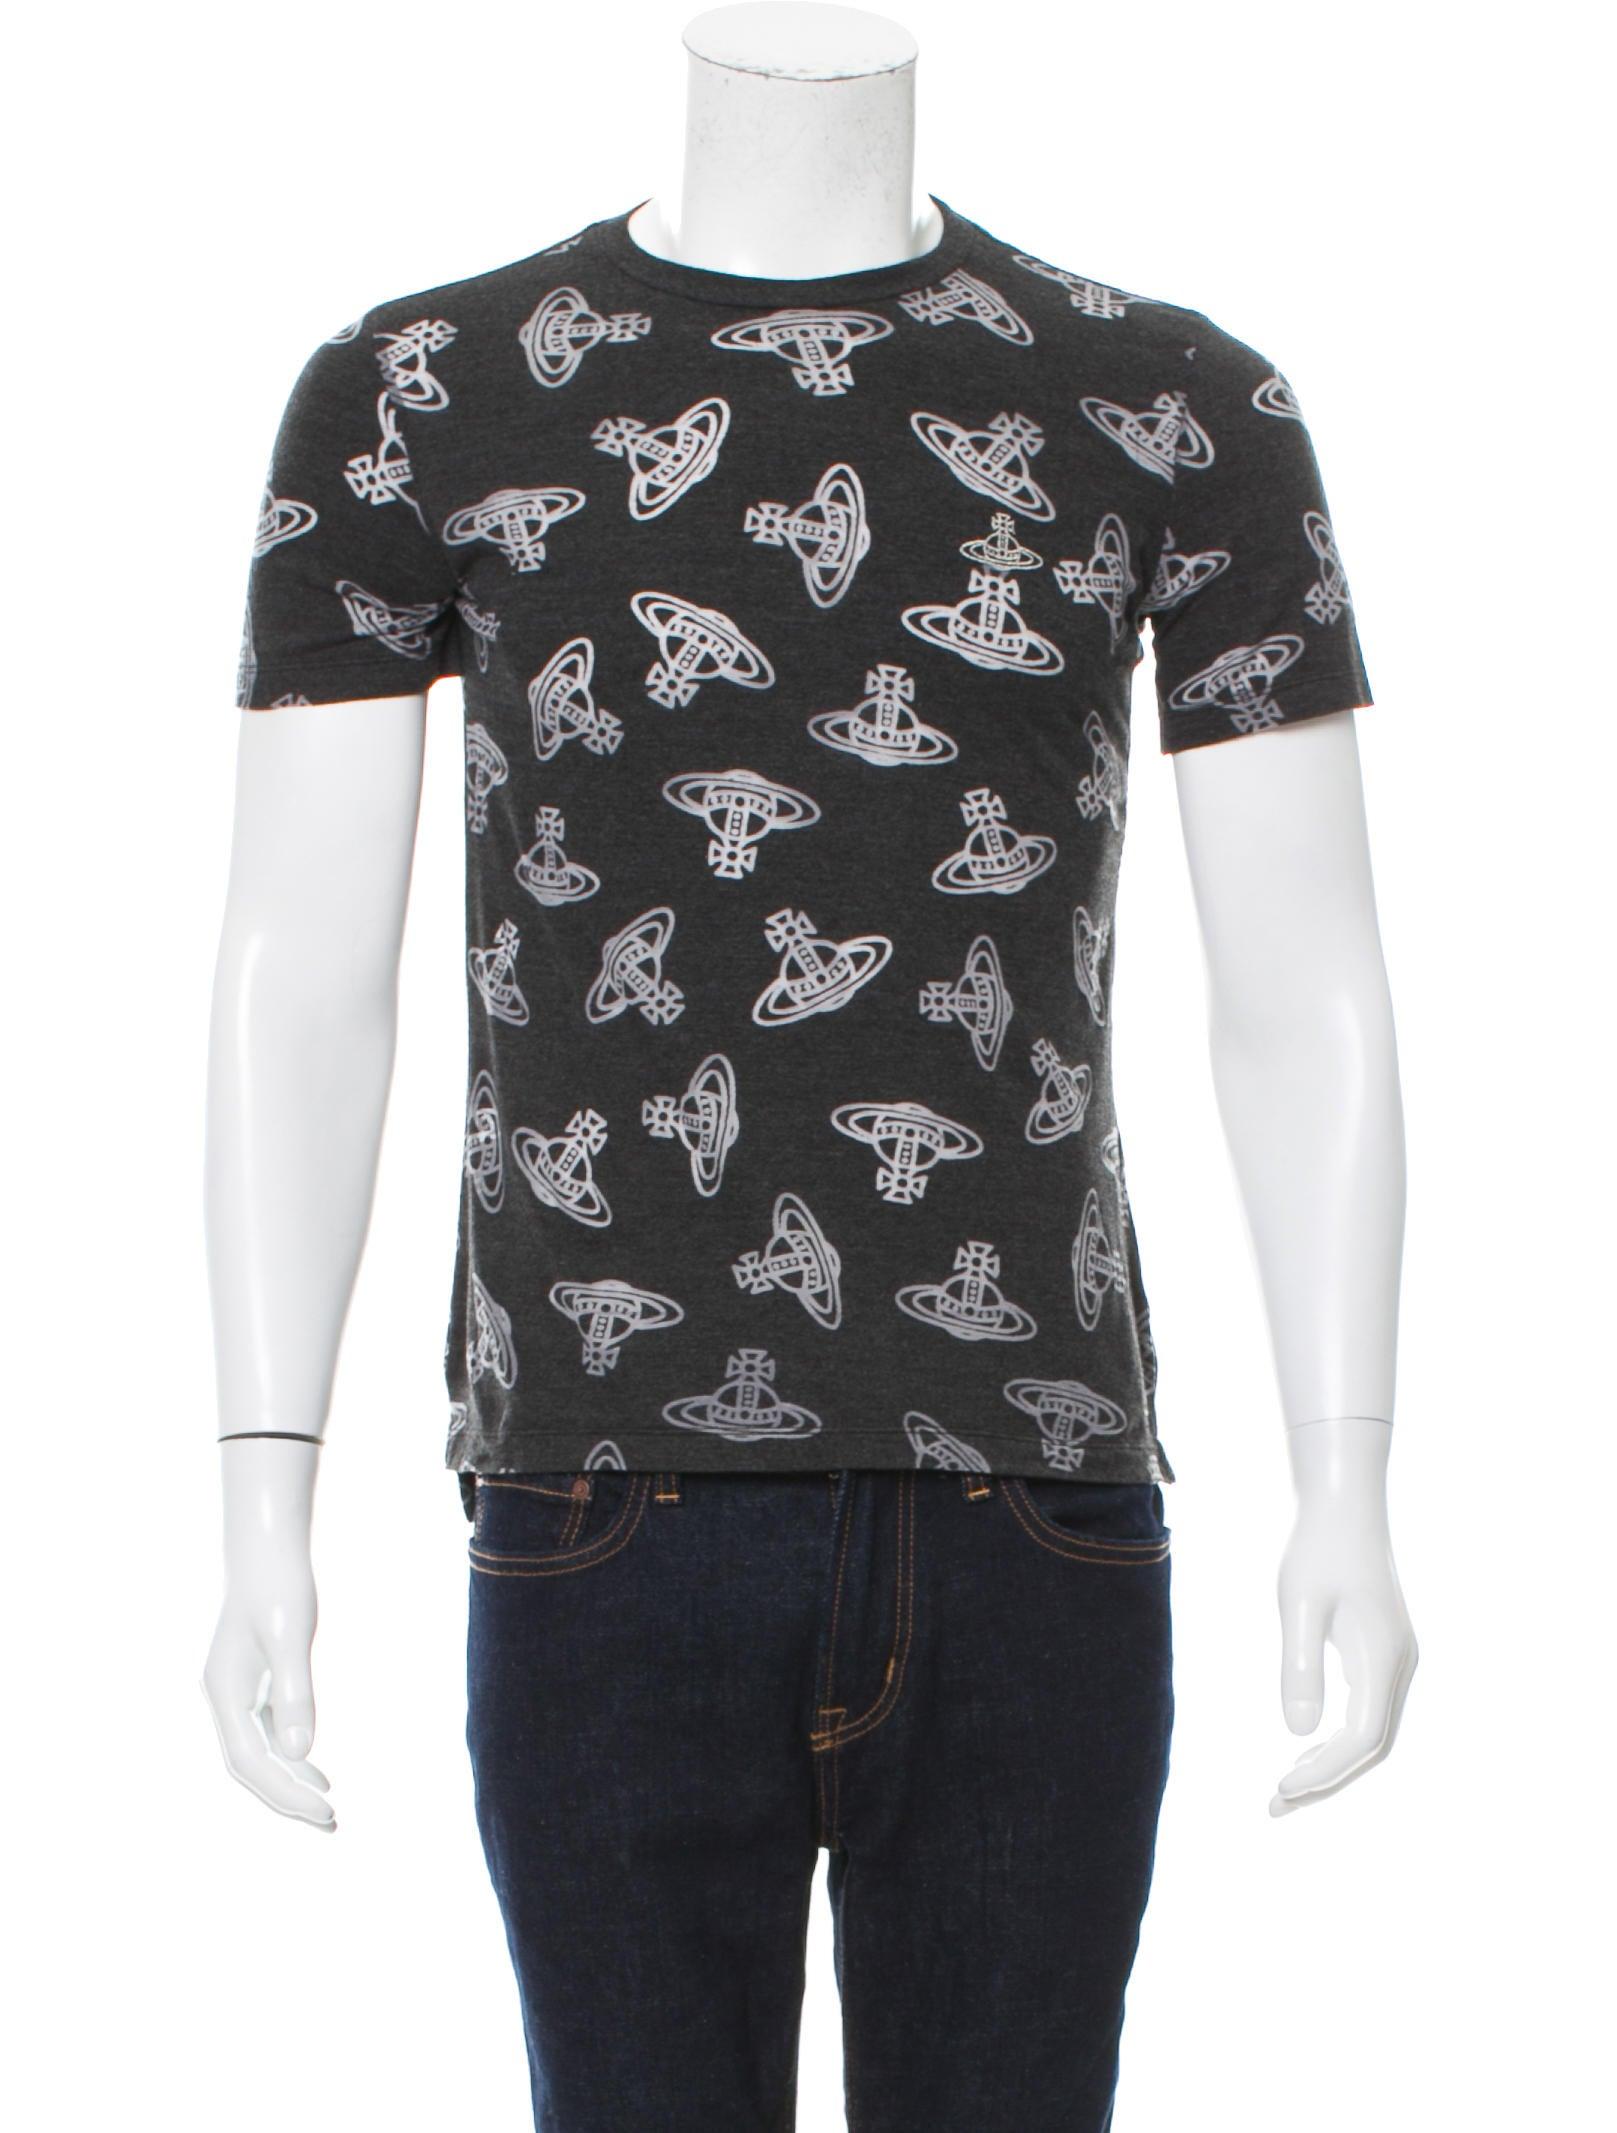 Vivienne westwood anglomania time machine print t shirt w for Machine to print t shirts